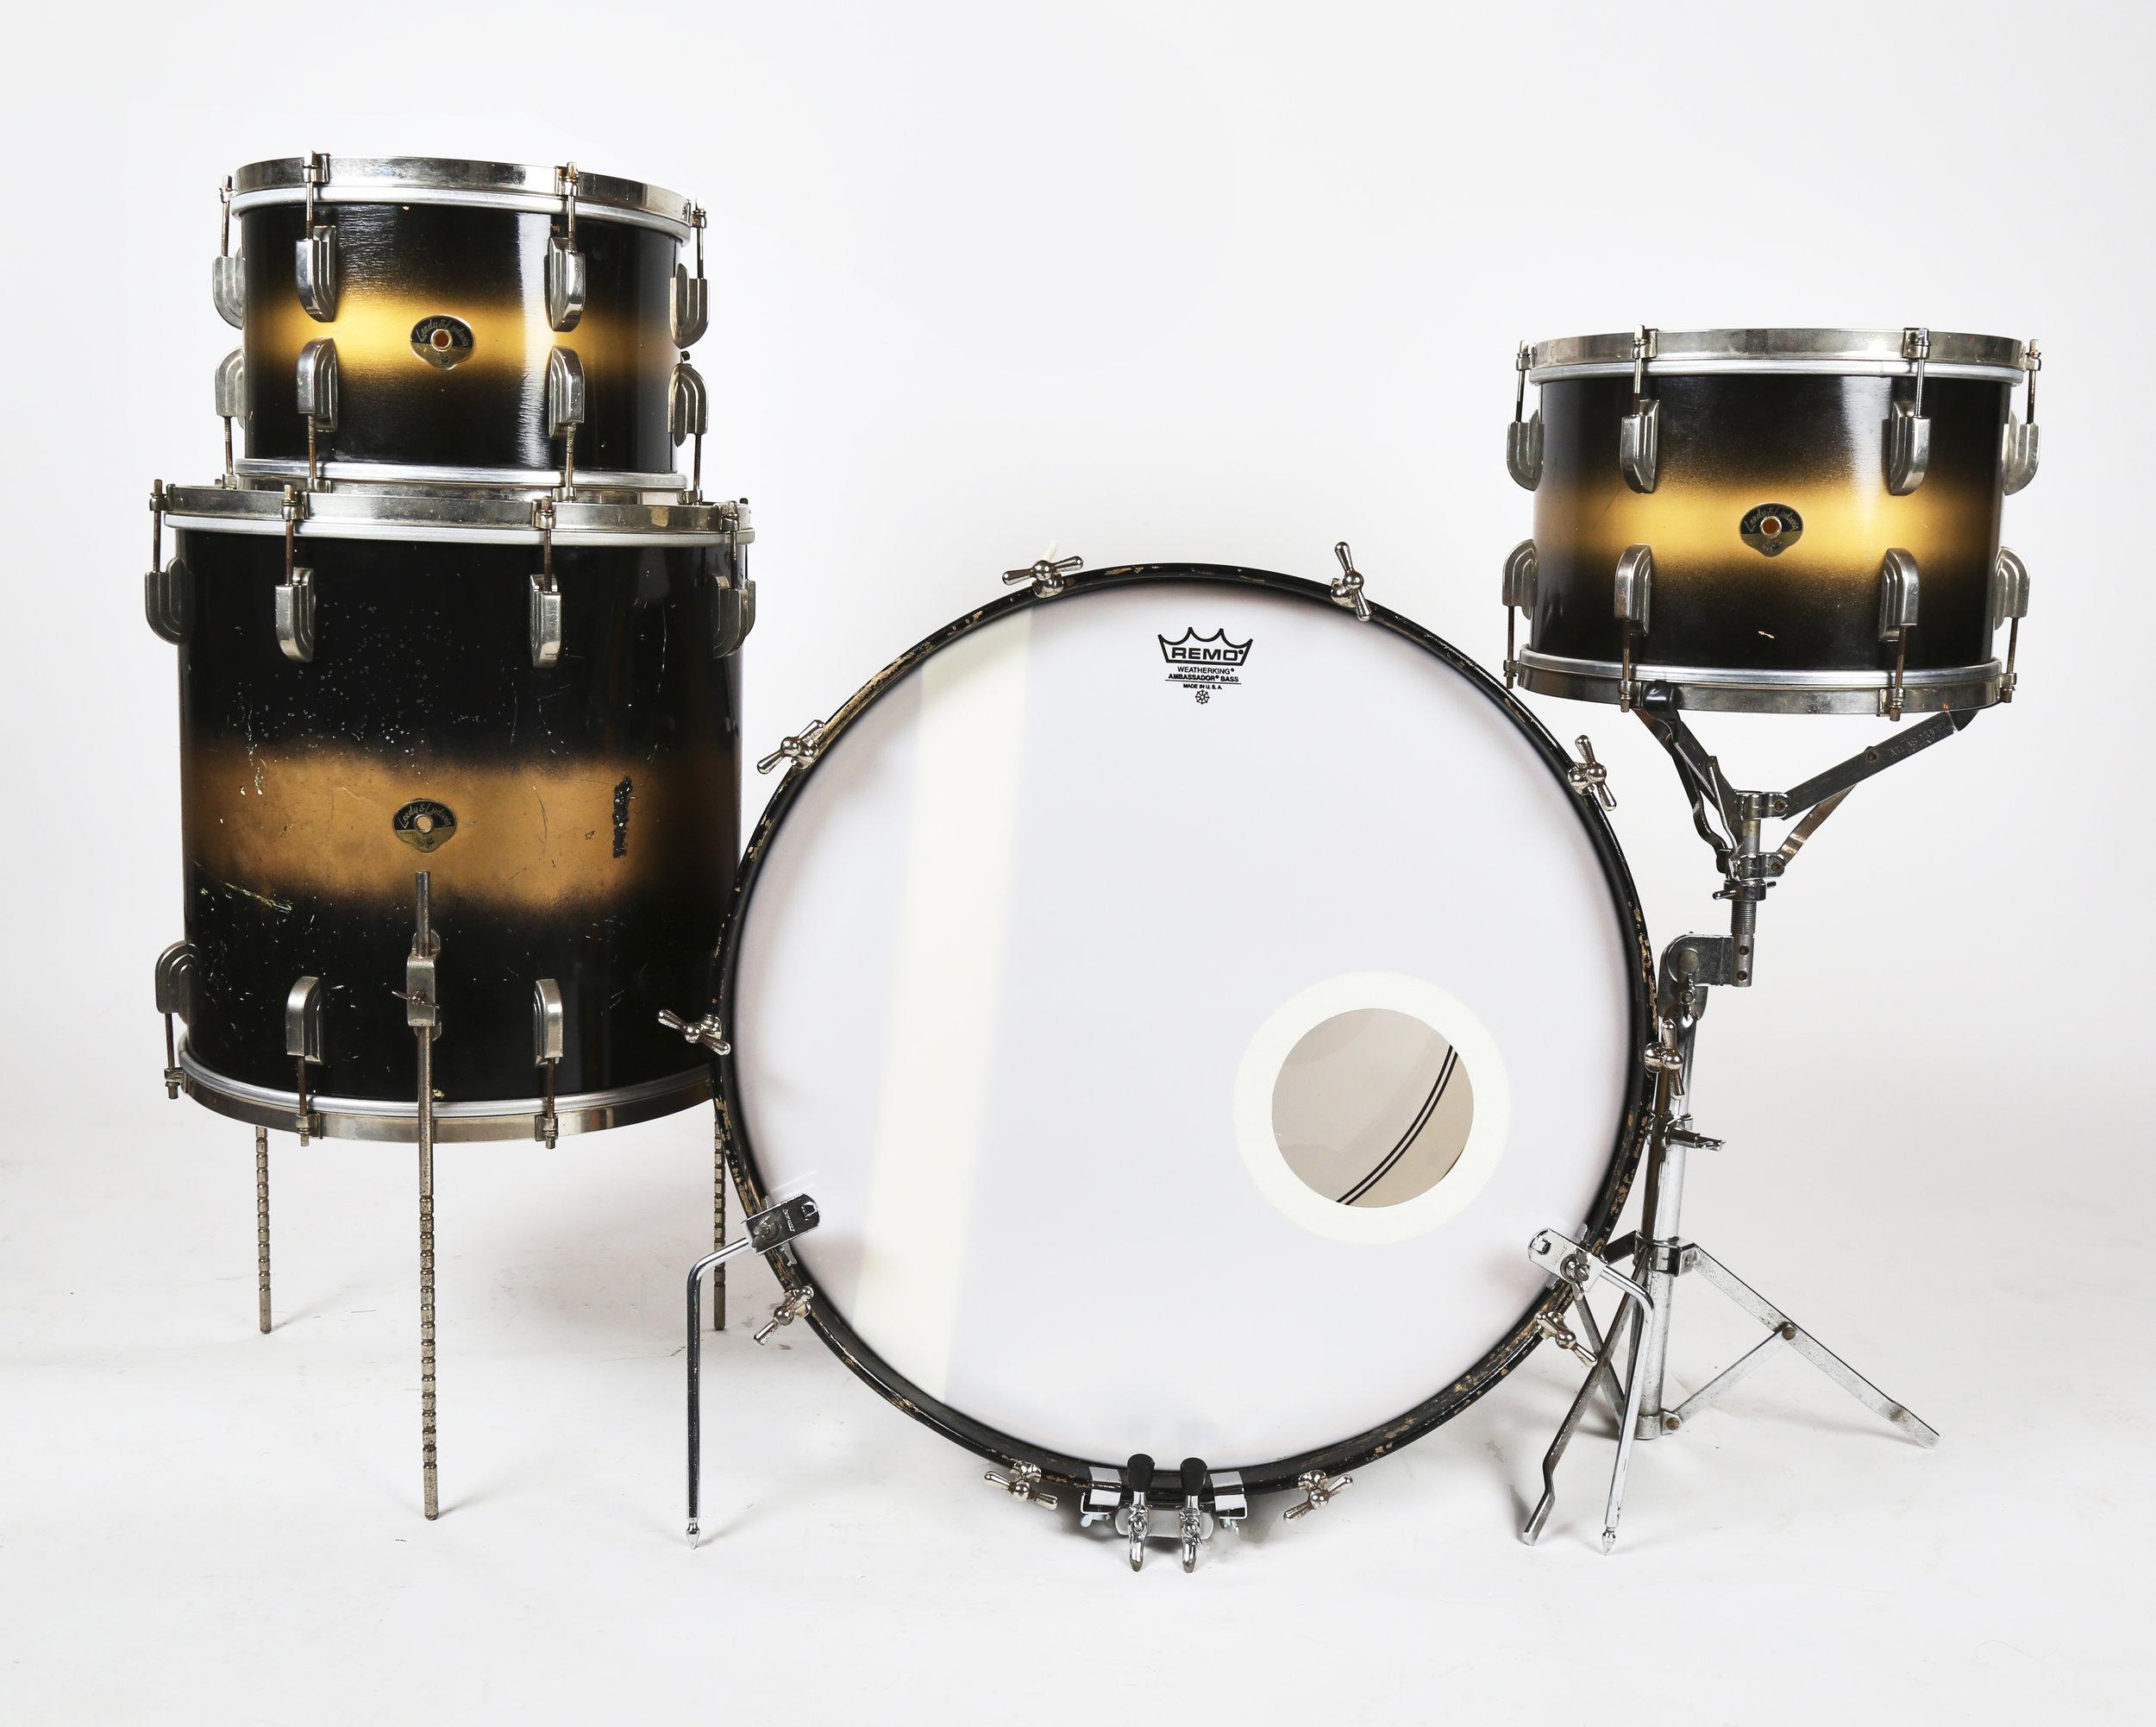 Dorio Vintage Drum_53 Leedy Ludwig_1817.jpg